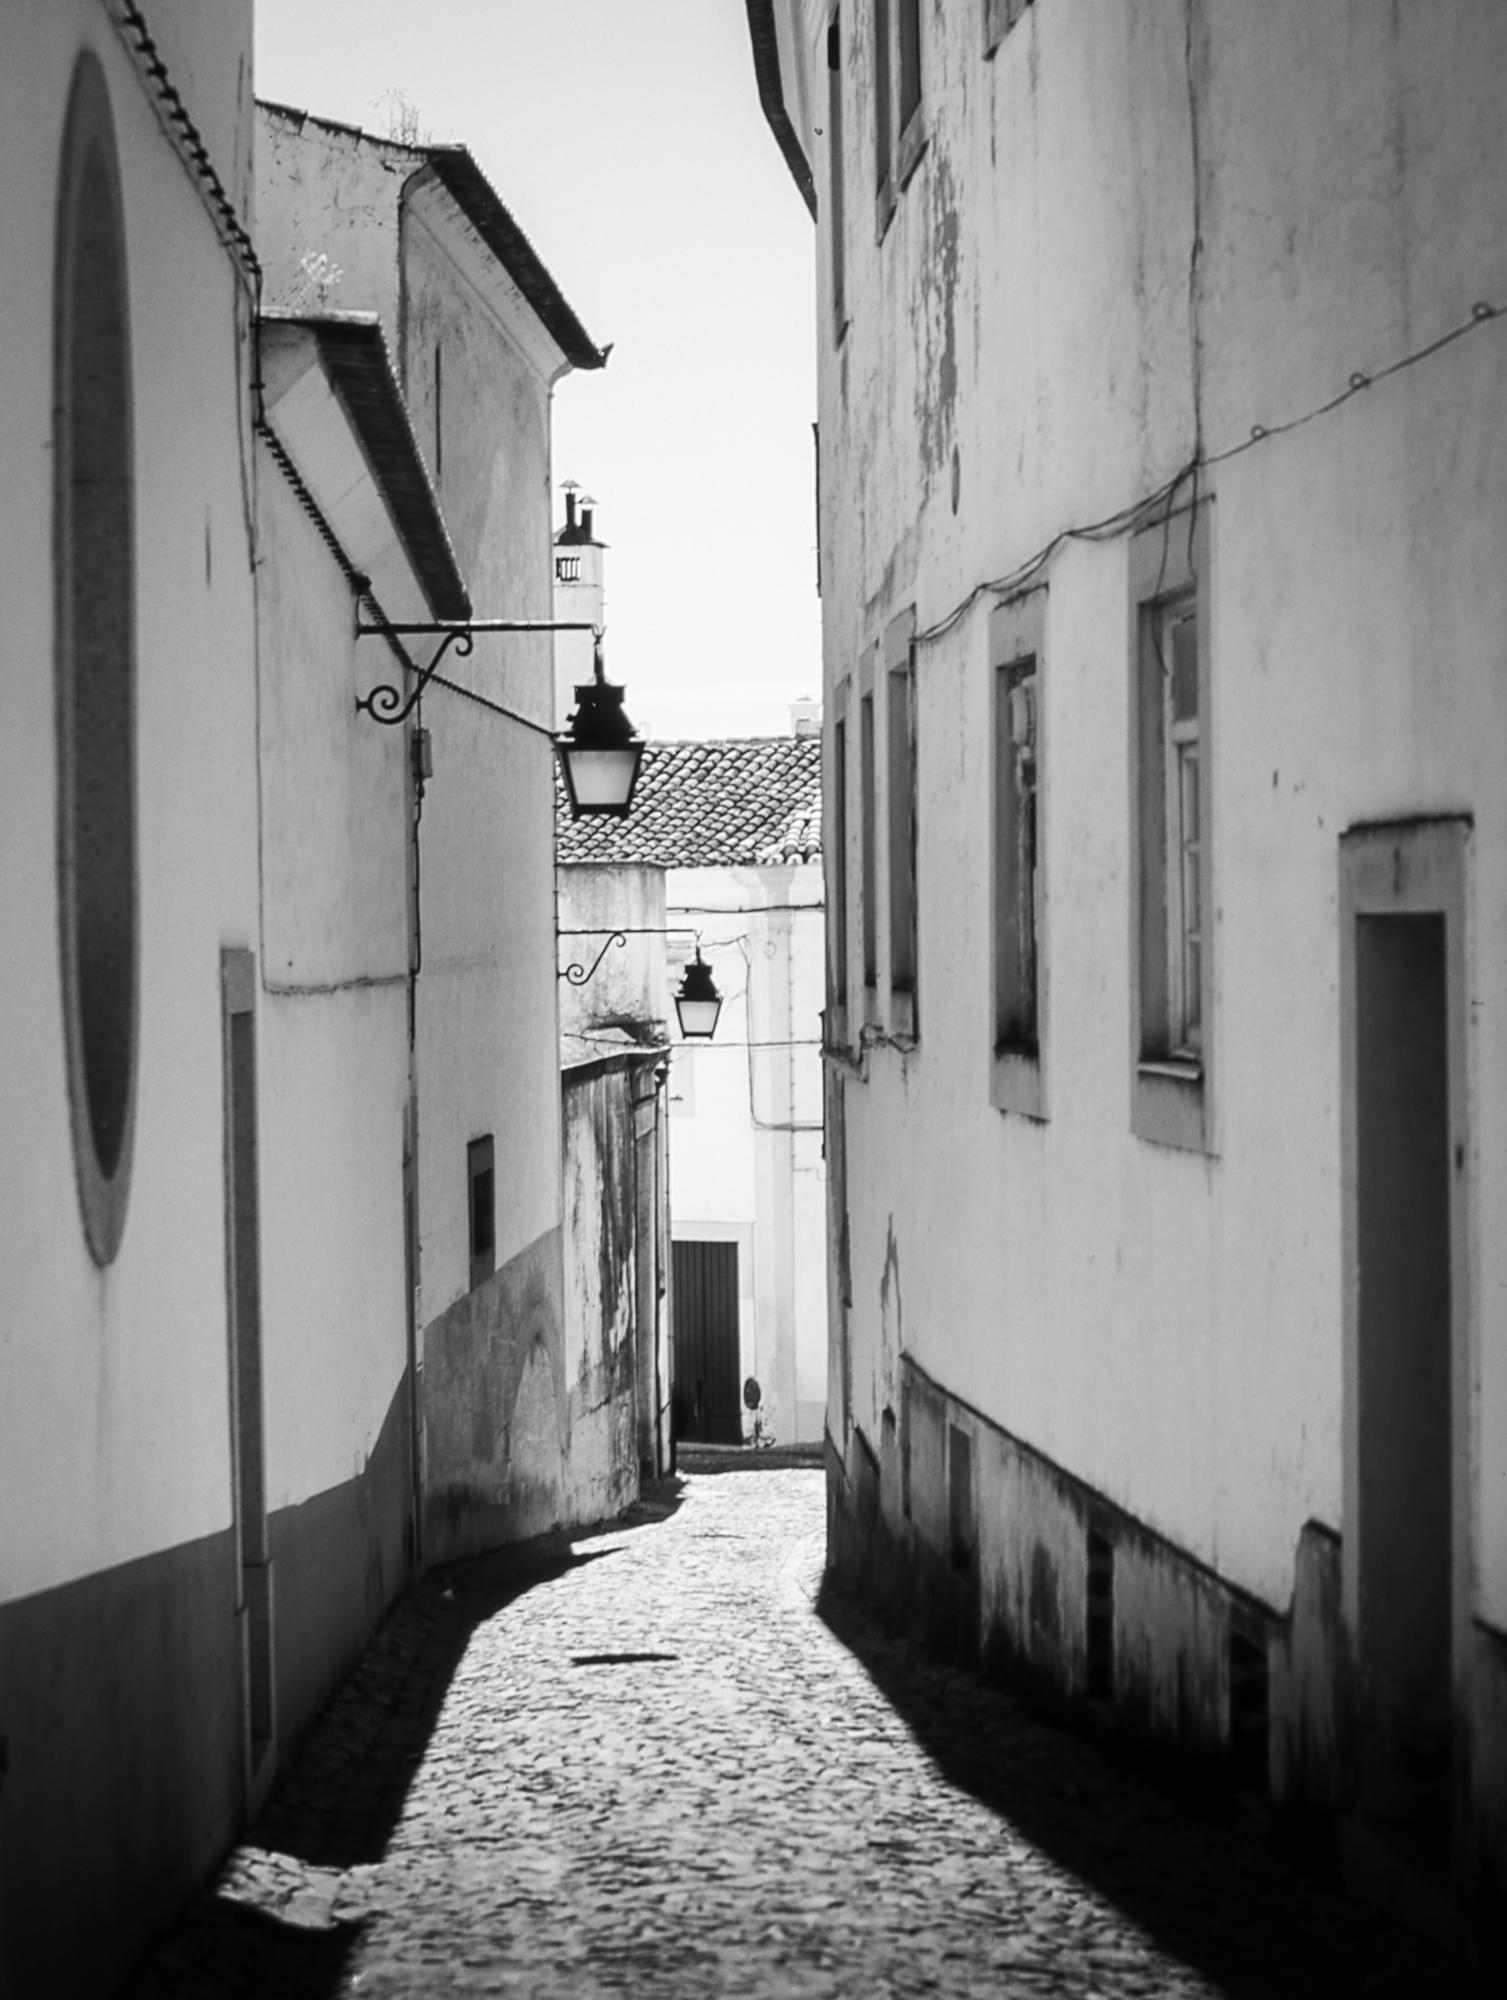 provia_100f_portugal194.jpg